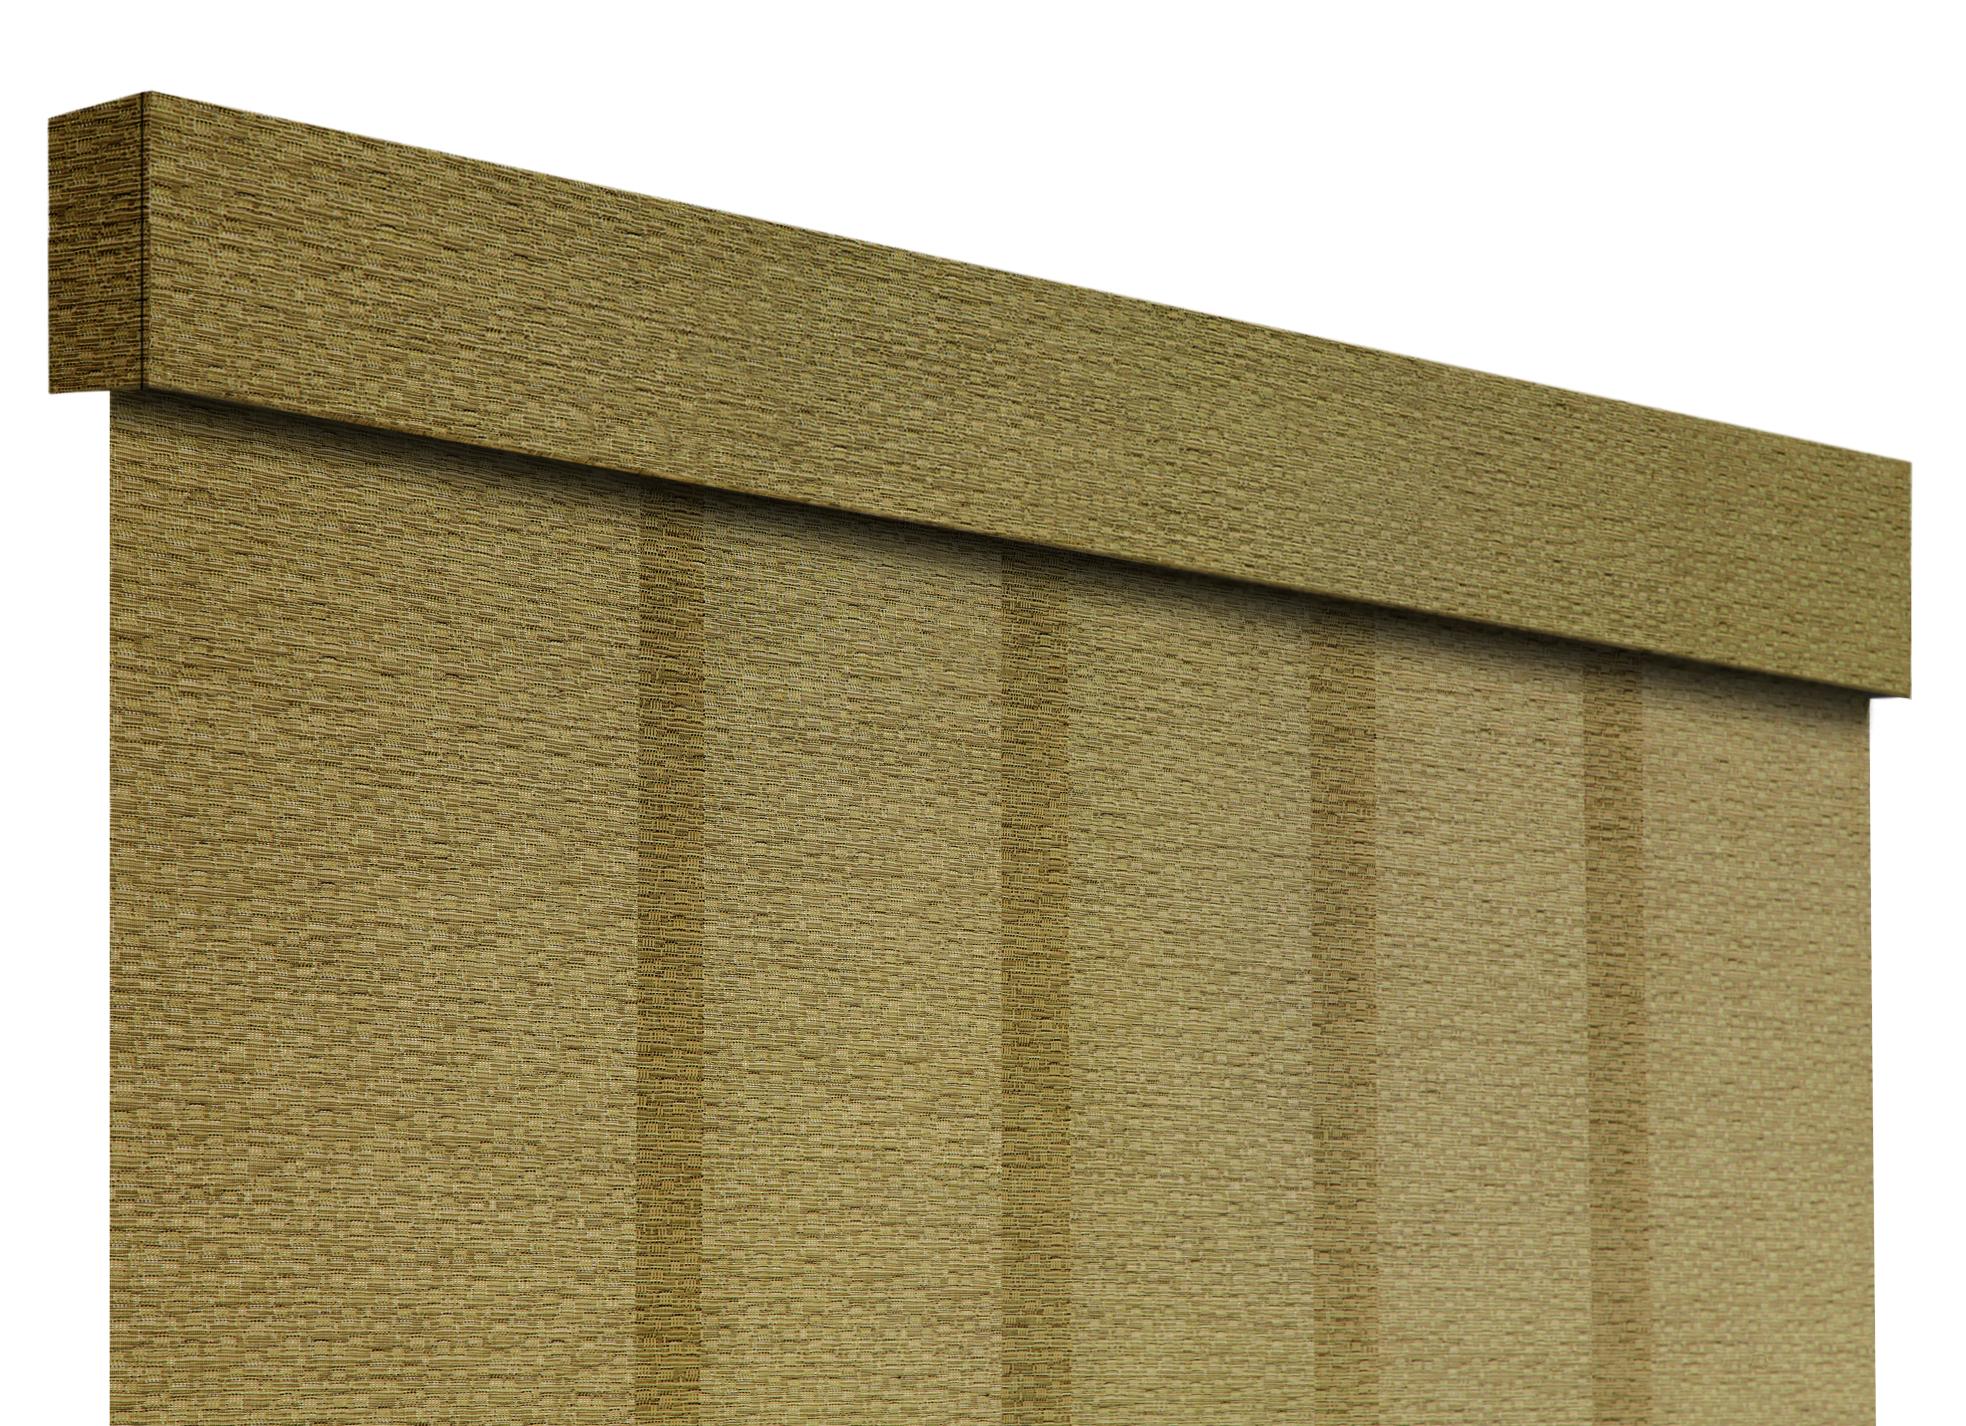 2016_Skyline_Indian Basket_Fabric Detail.jpeg